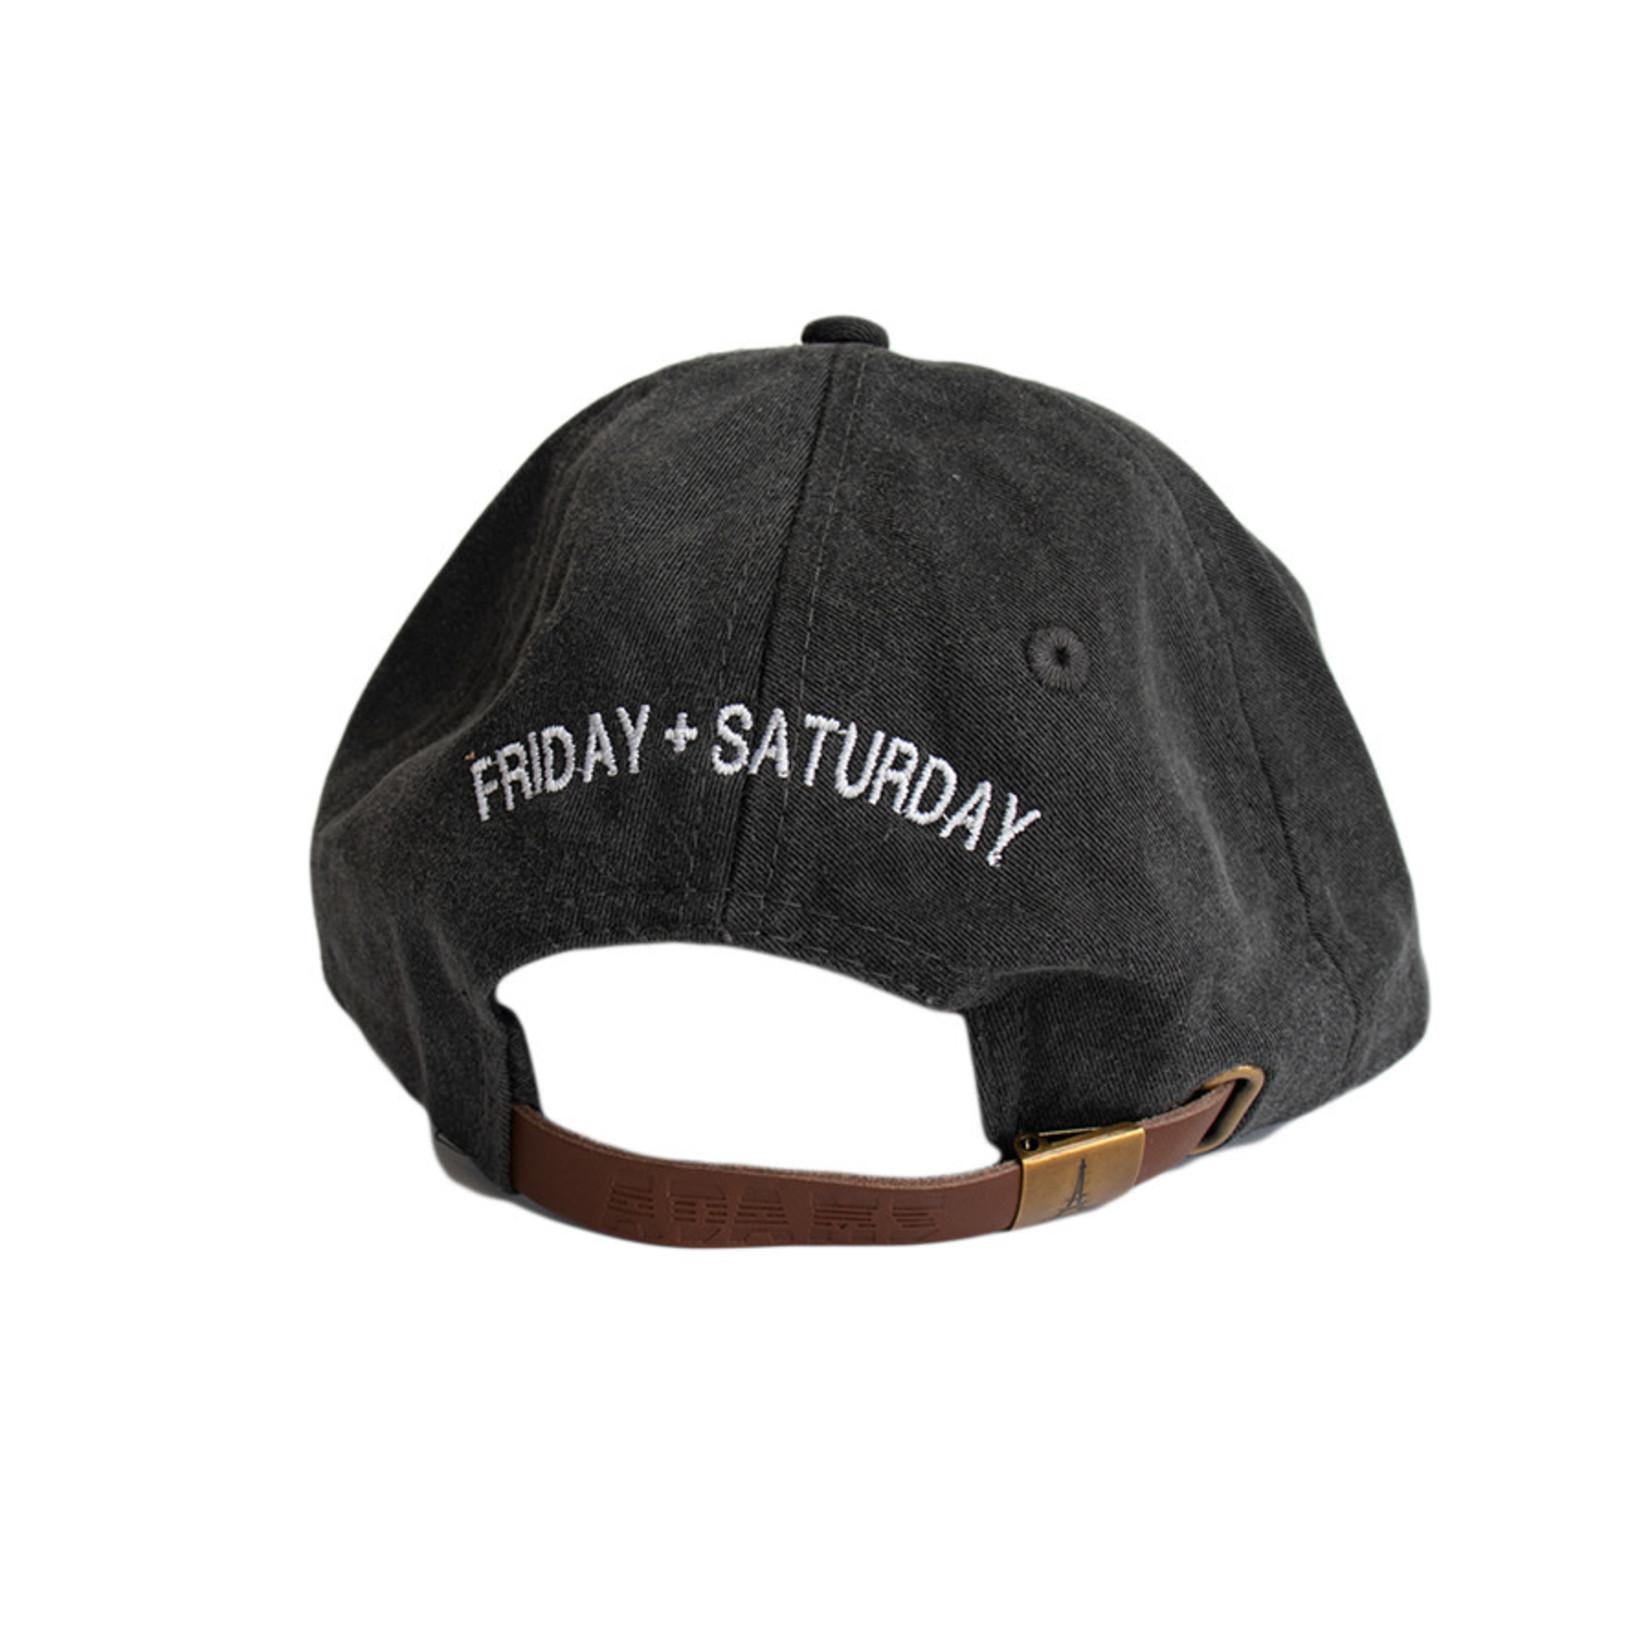 FRIDAY + SATURDAY Mama Hat